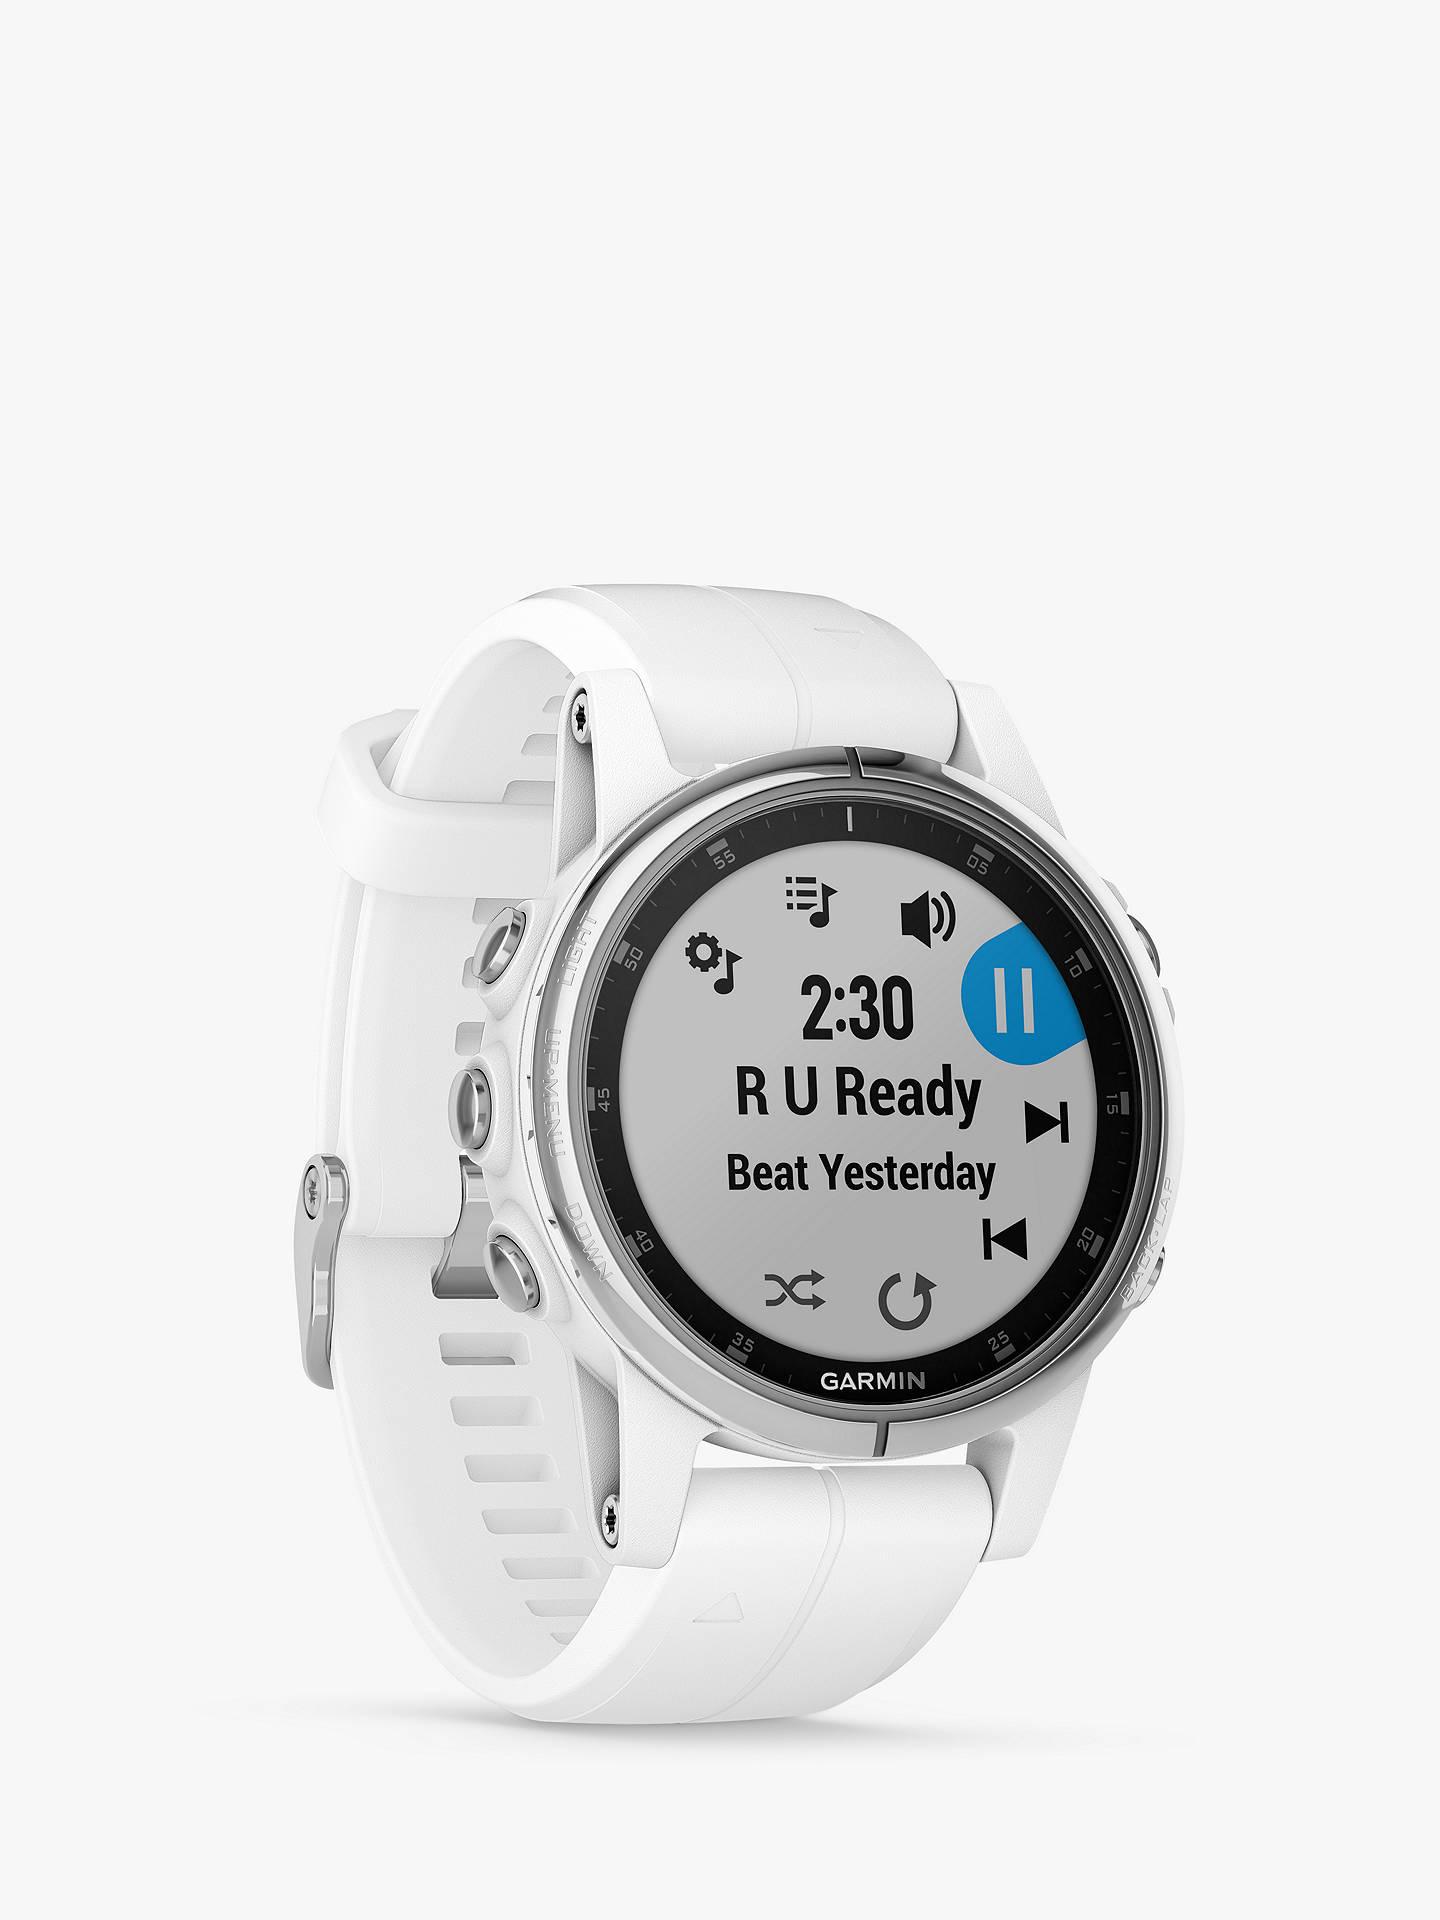 Garmin Fenix 5s Plus Sapphire Gps Multisport Watch 4 2cm At John